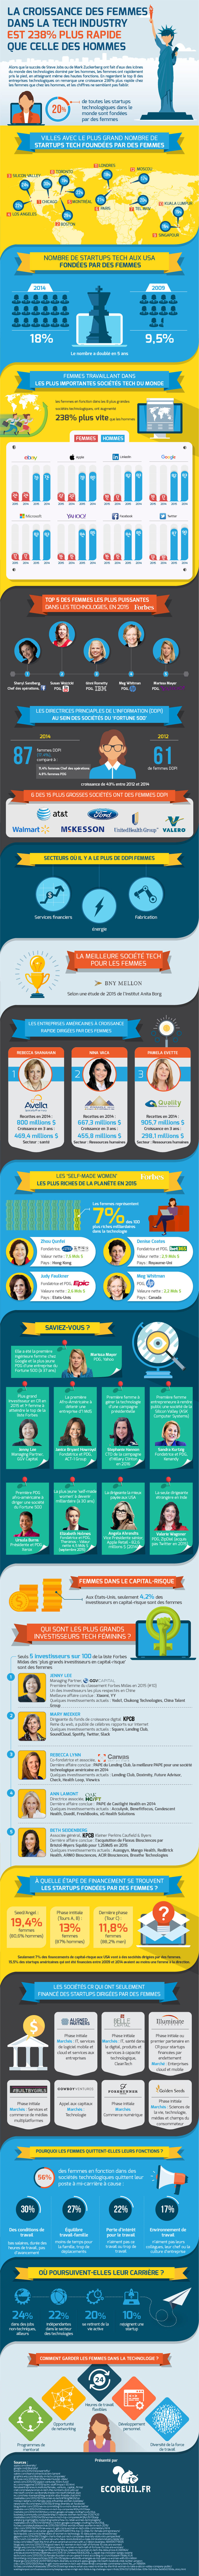 Women-in-Tech_Infographic-JUPDLC